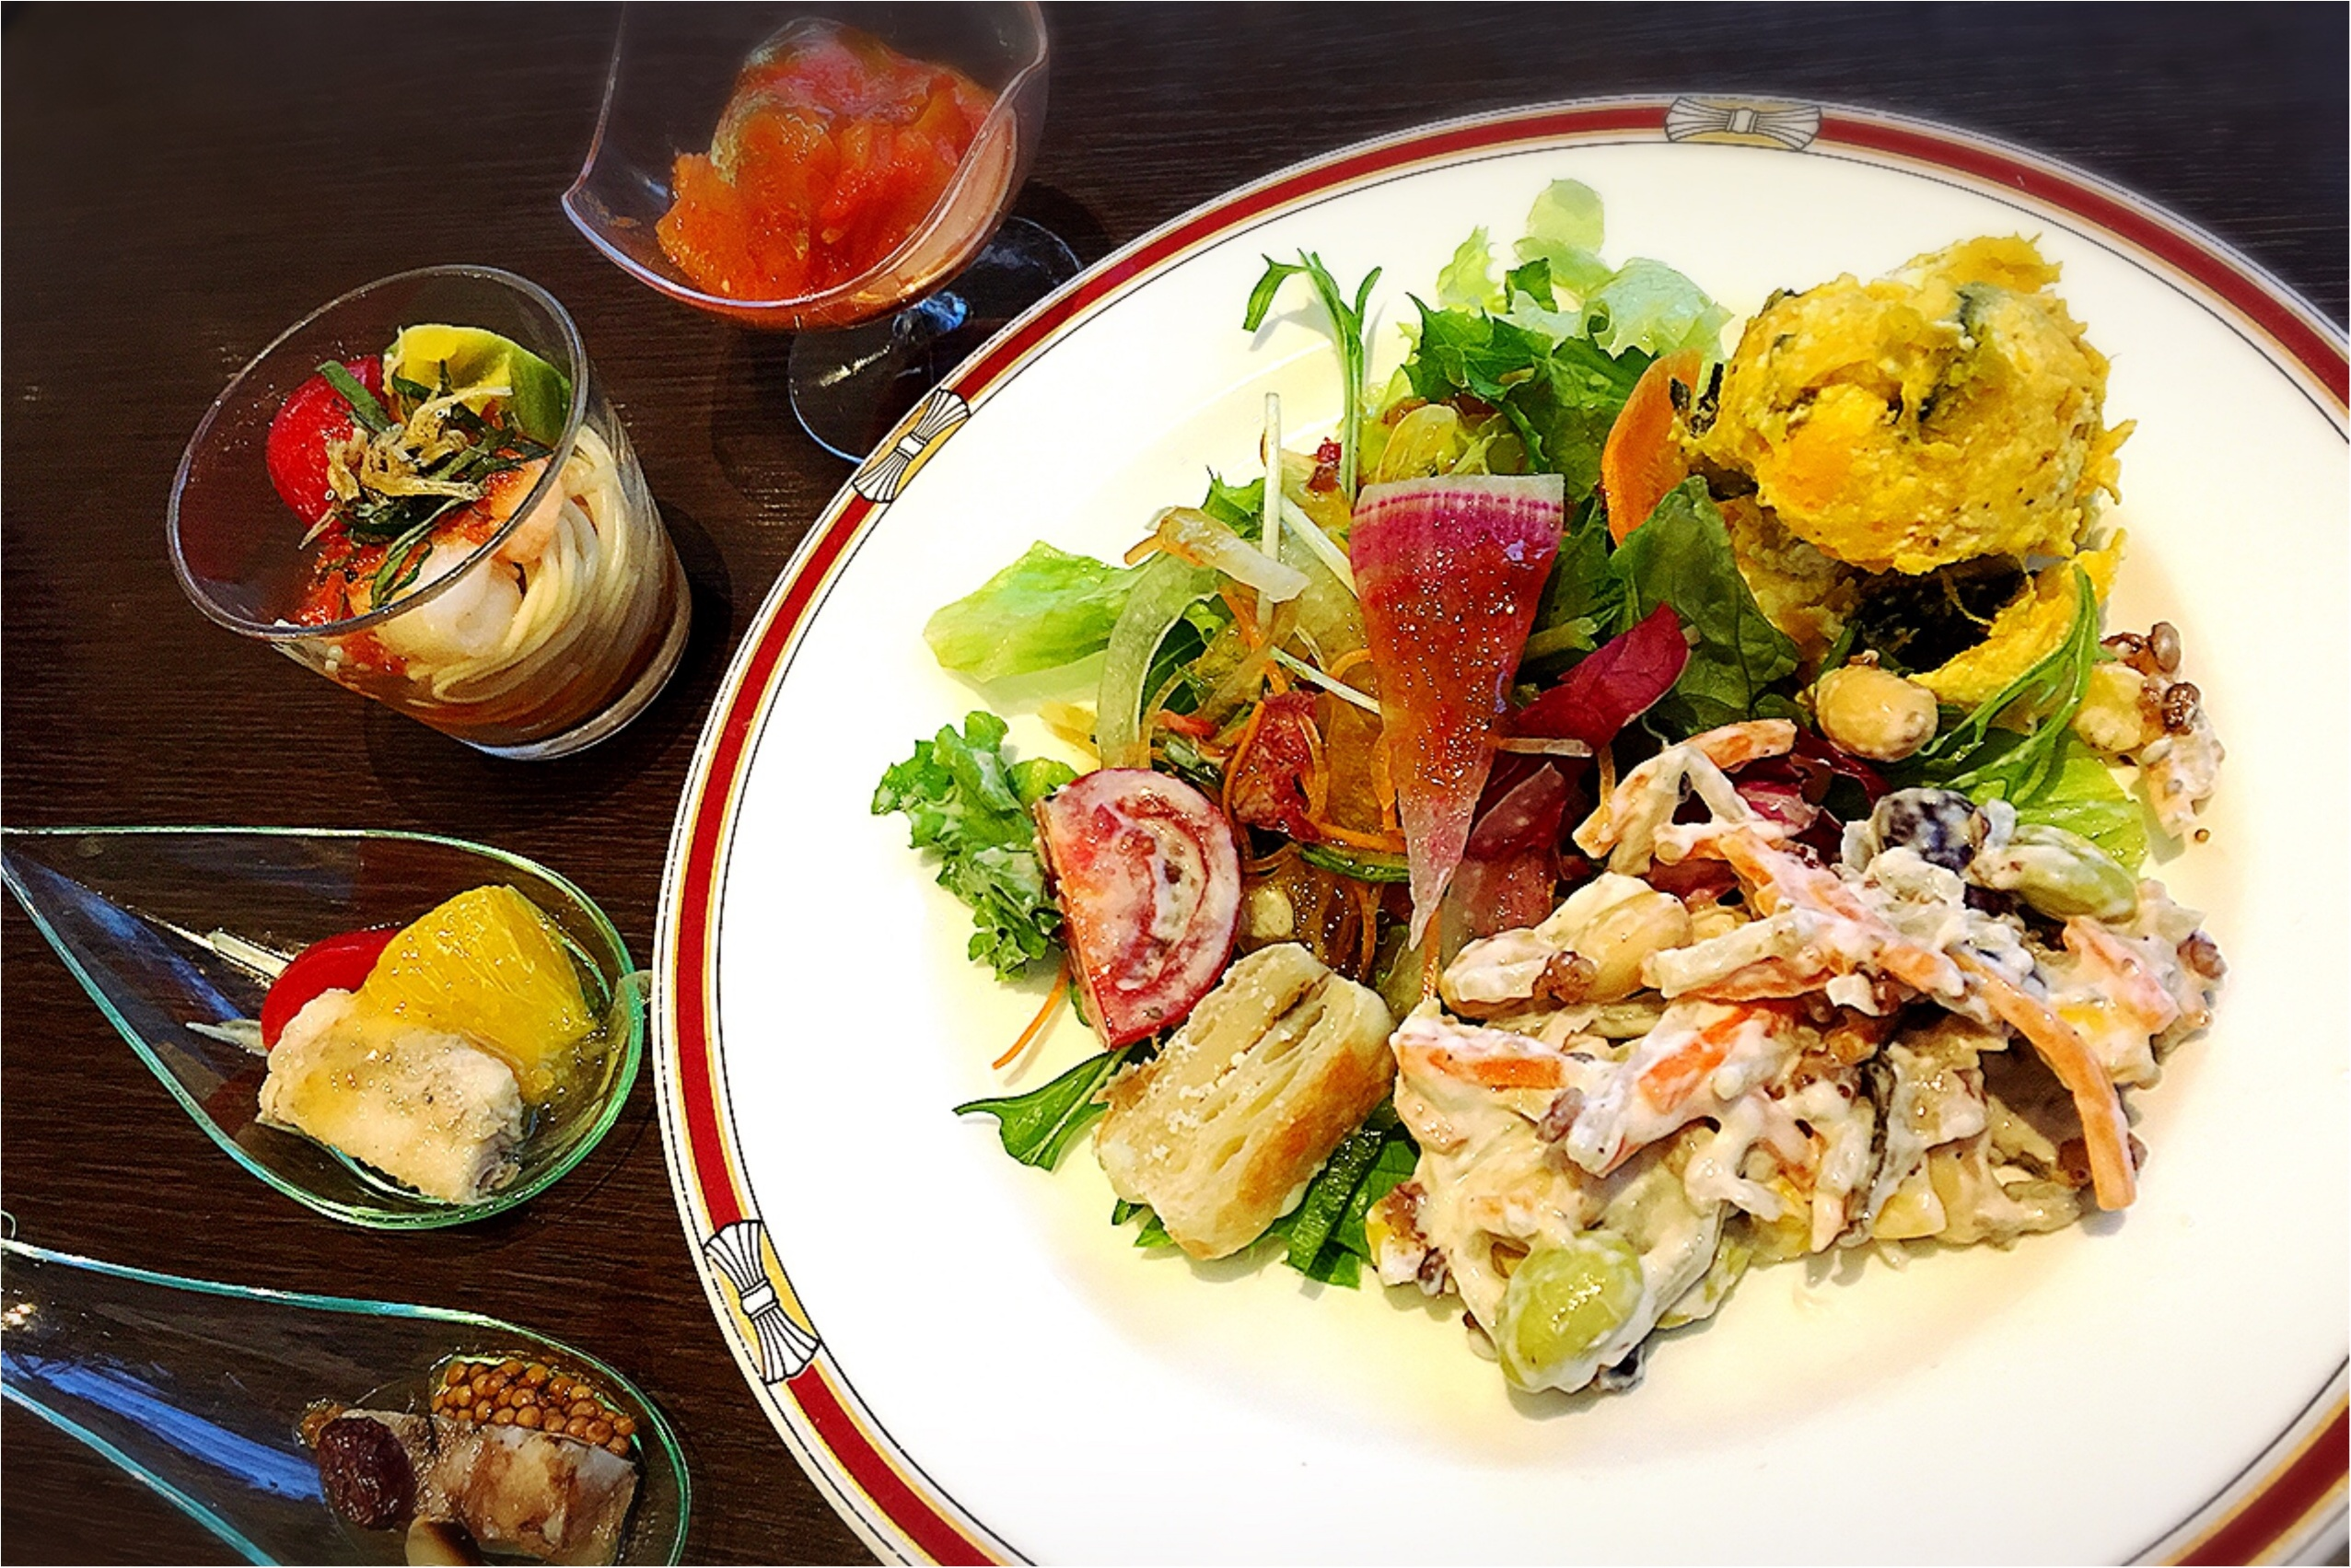 【DINNER】いまお得なディナーはココ!第一ホテル東京シーフォートへ行ってきました☆_10